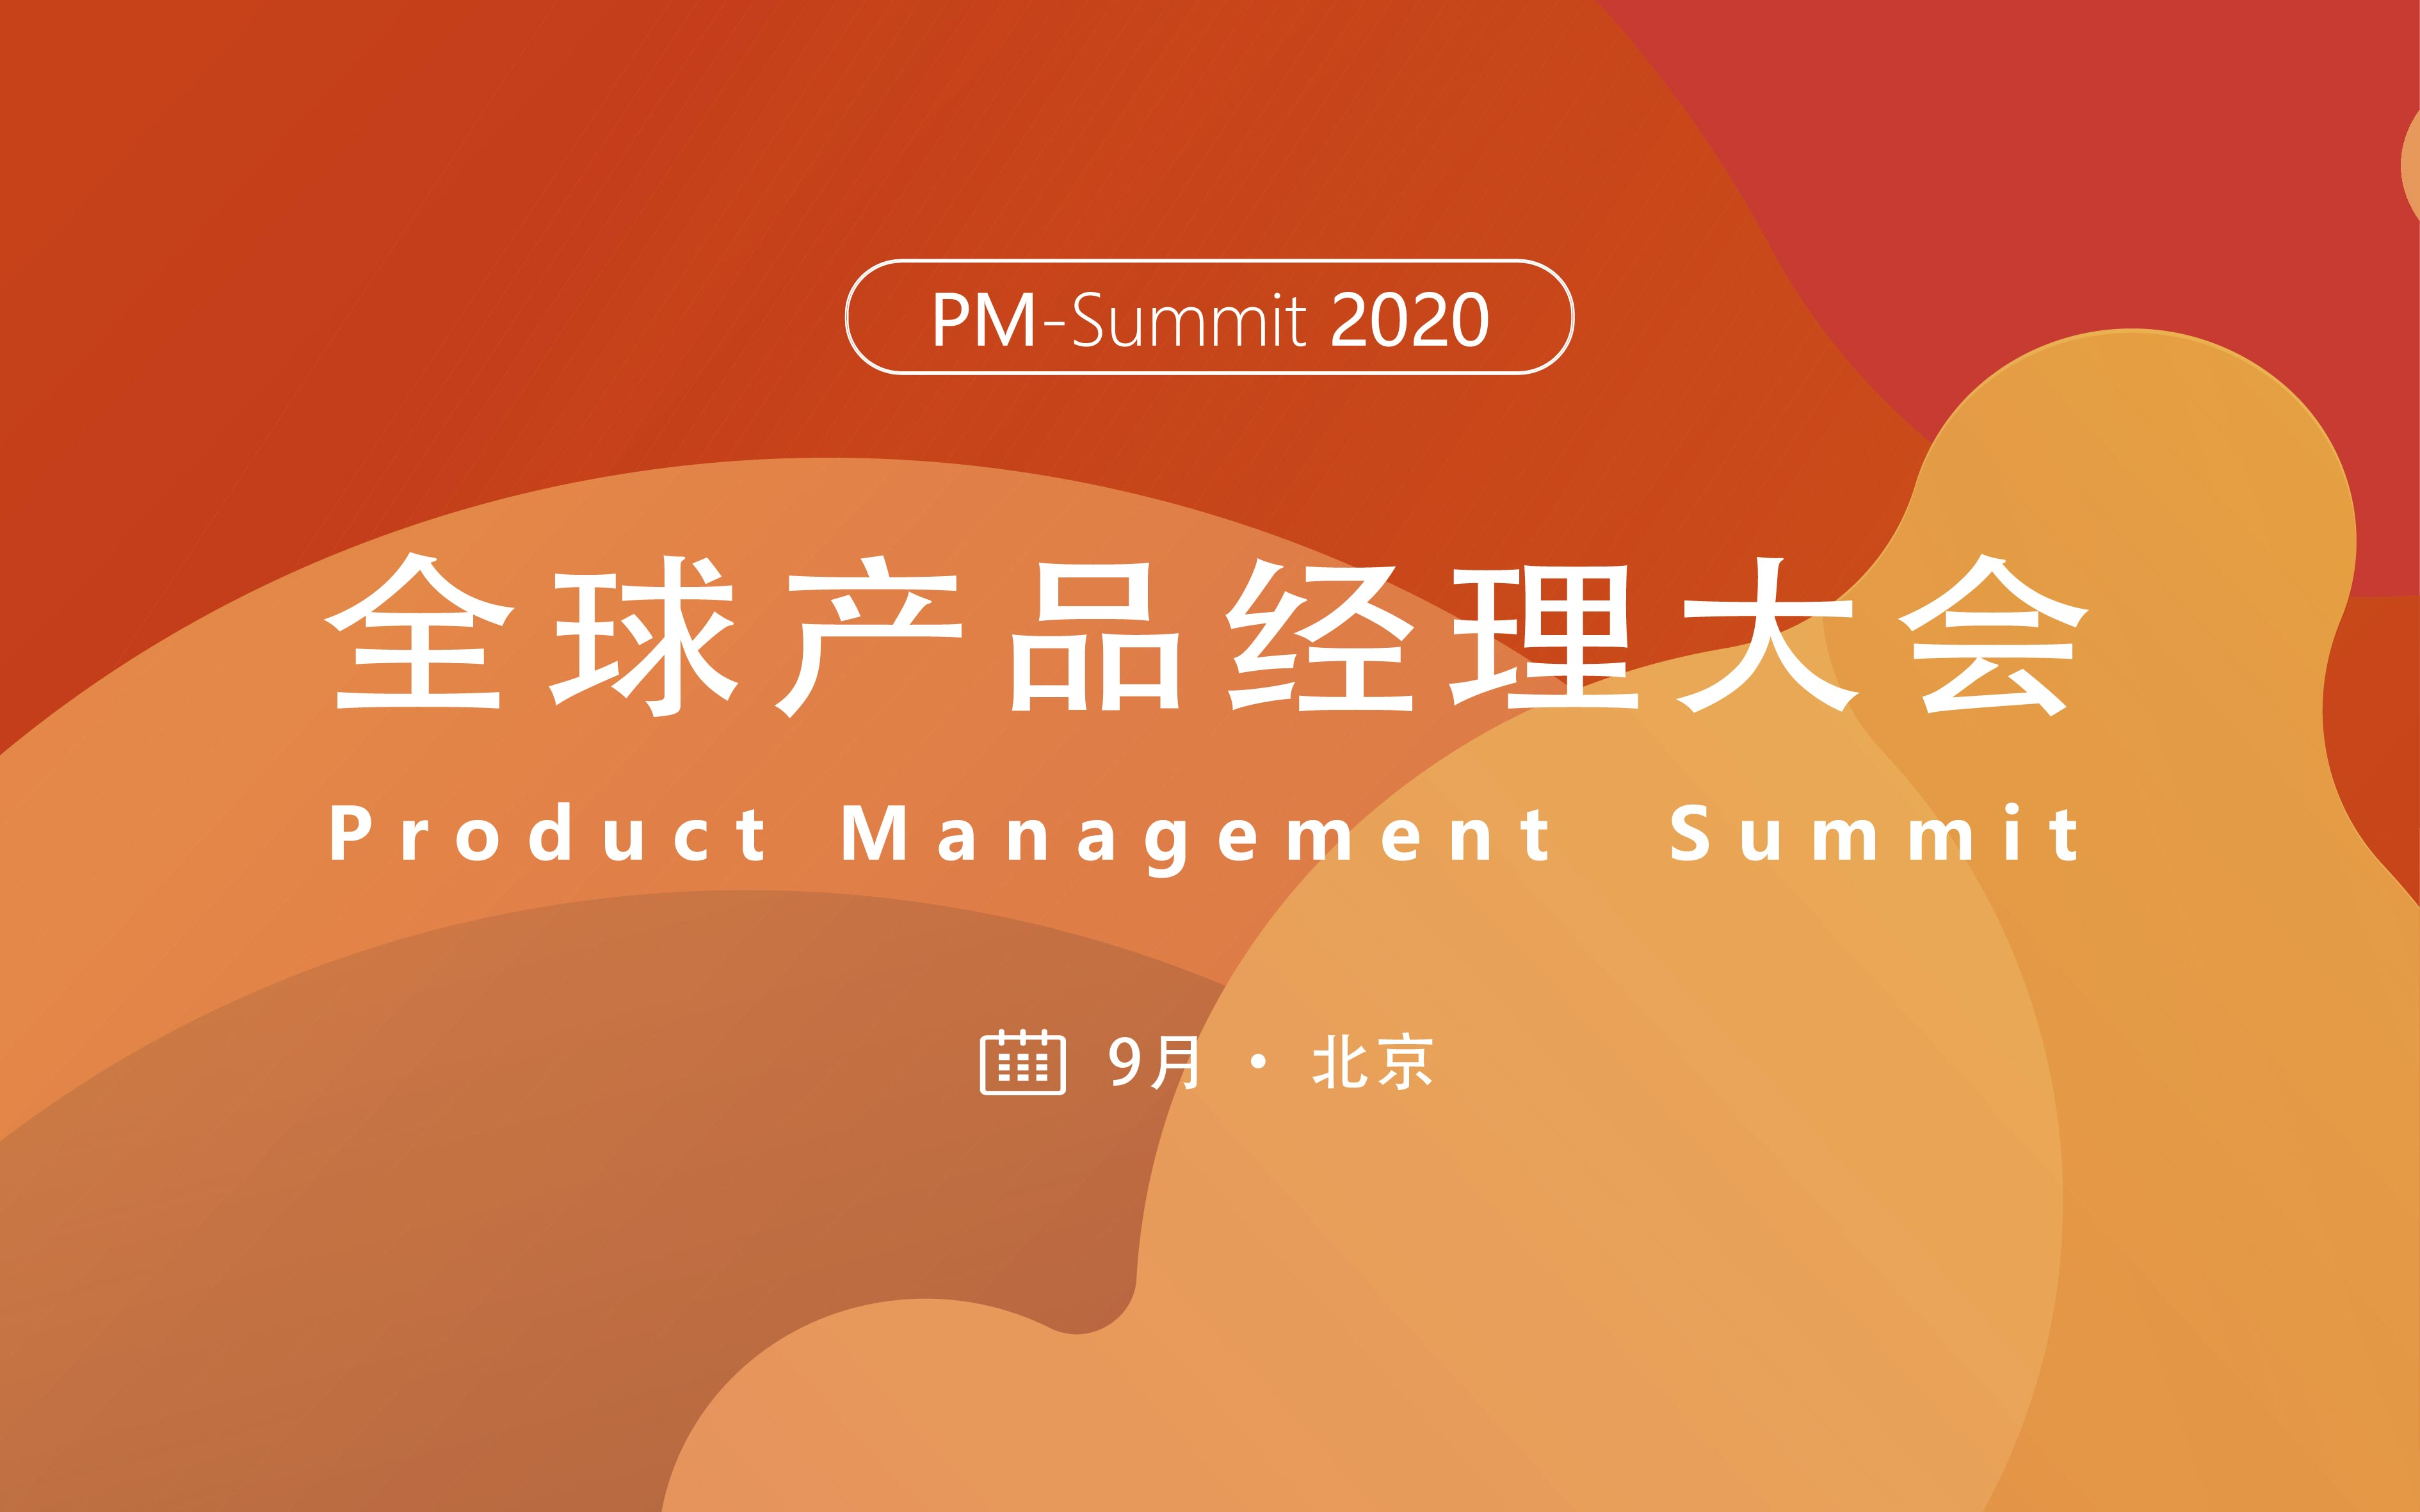 PM-Summit 2020全球產品經理大會 Product Management Summit